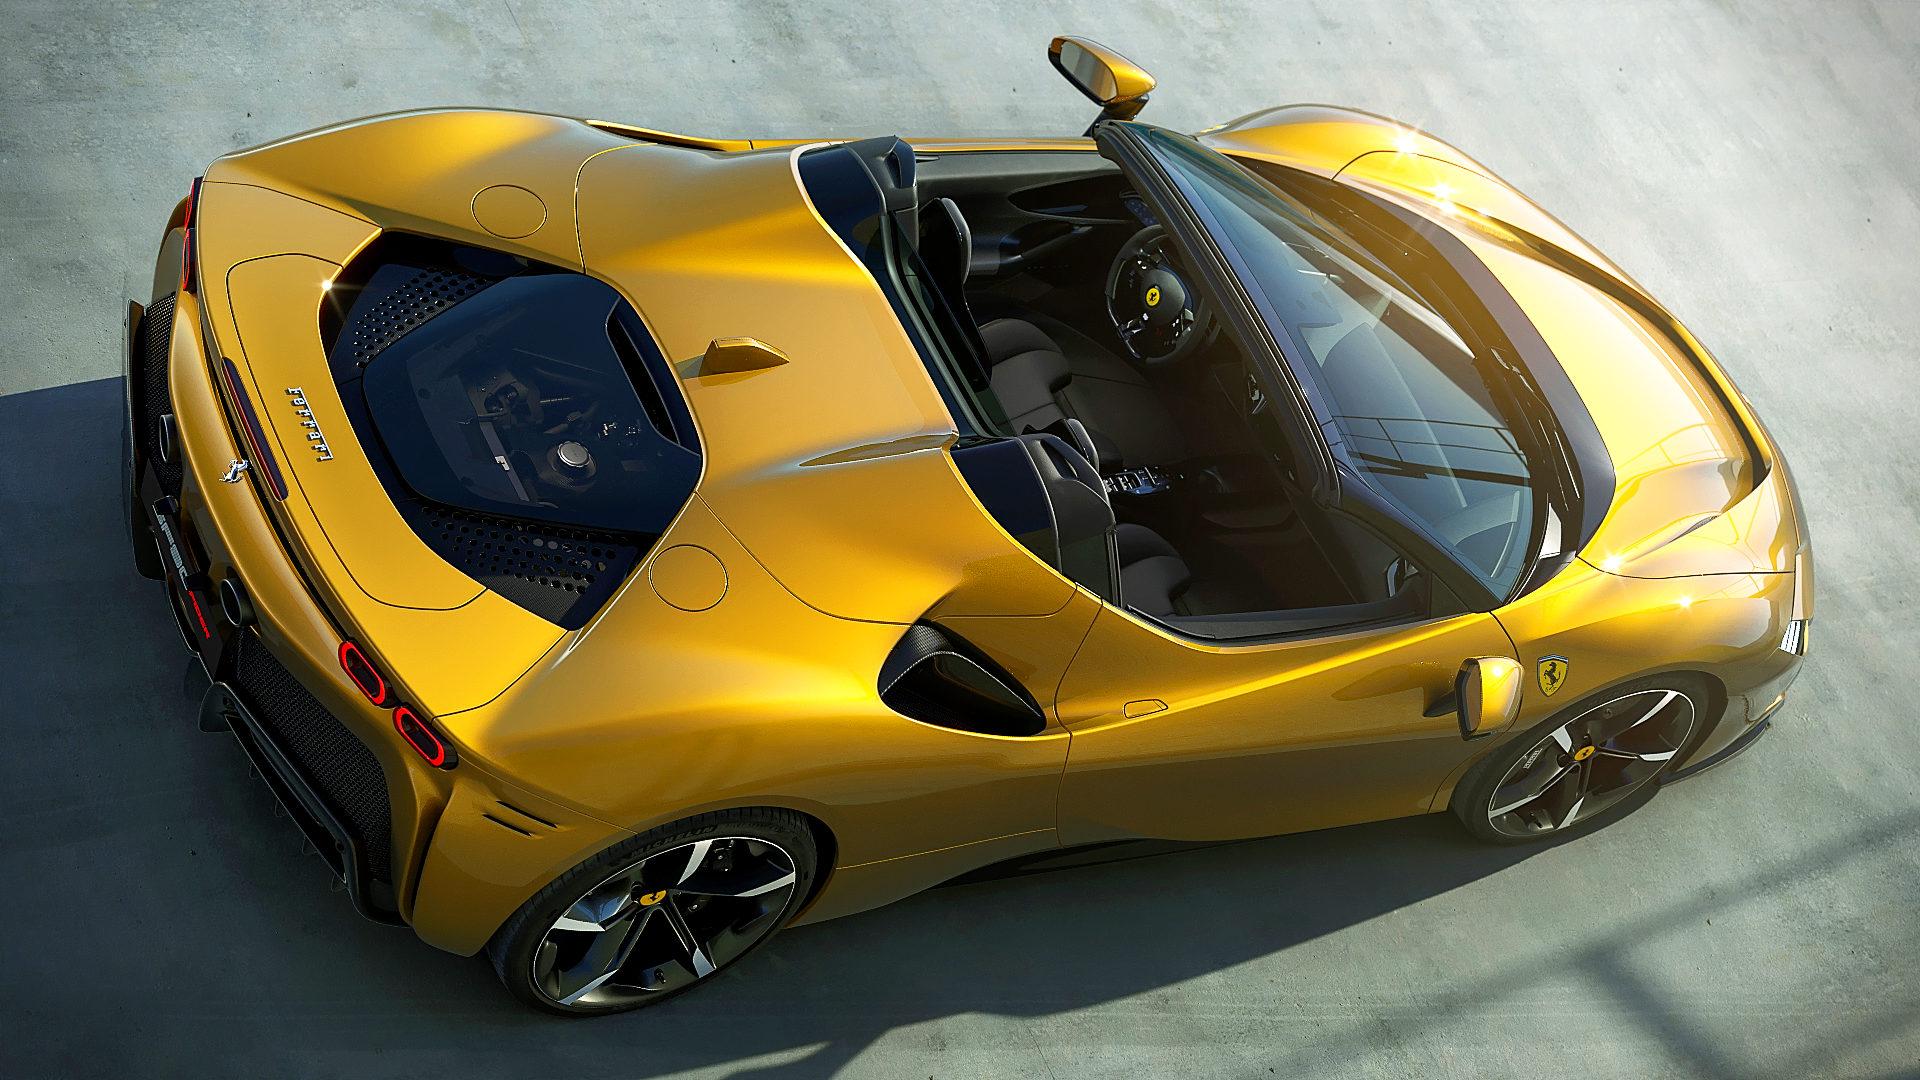 2021 ferrari sf90 spider convertible